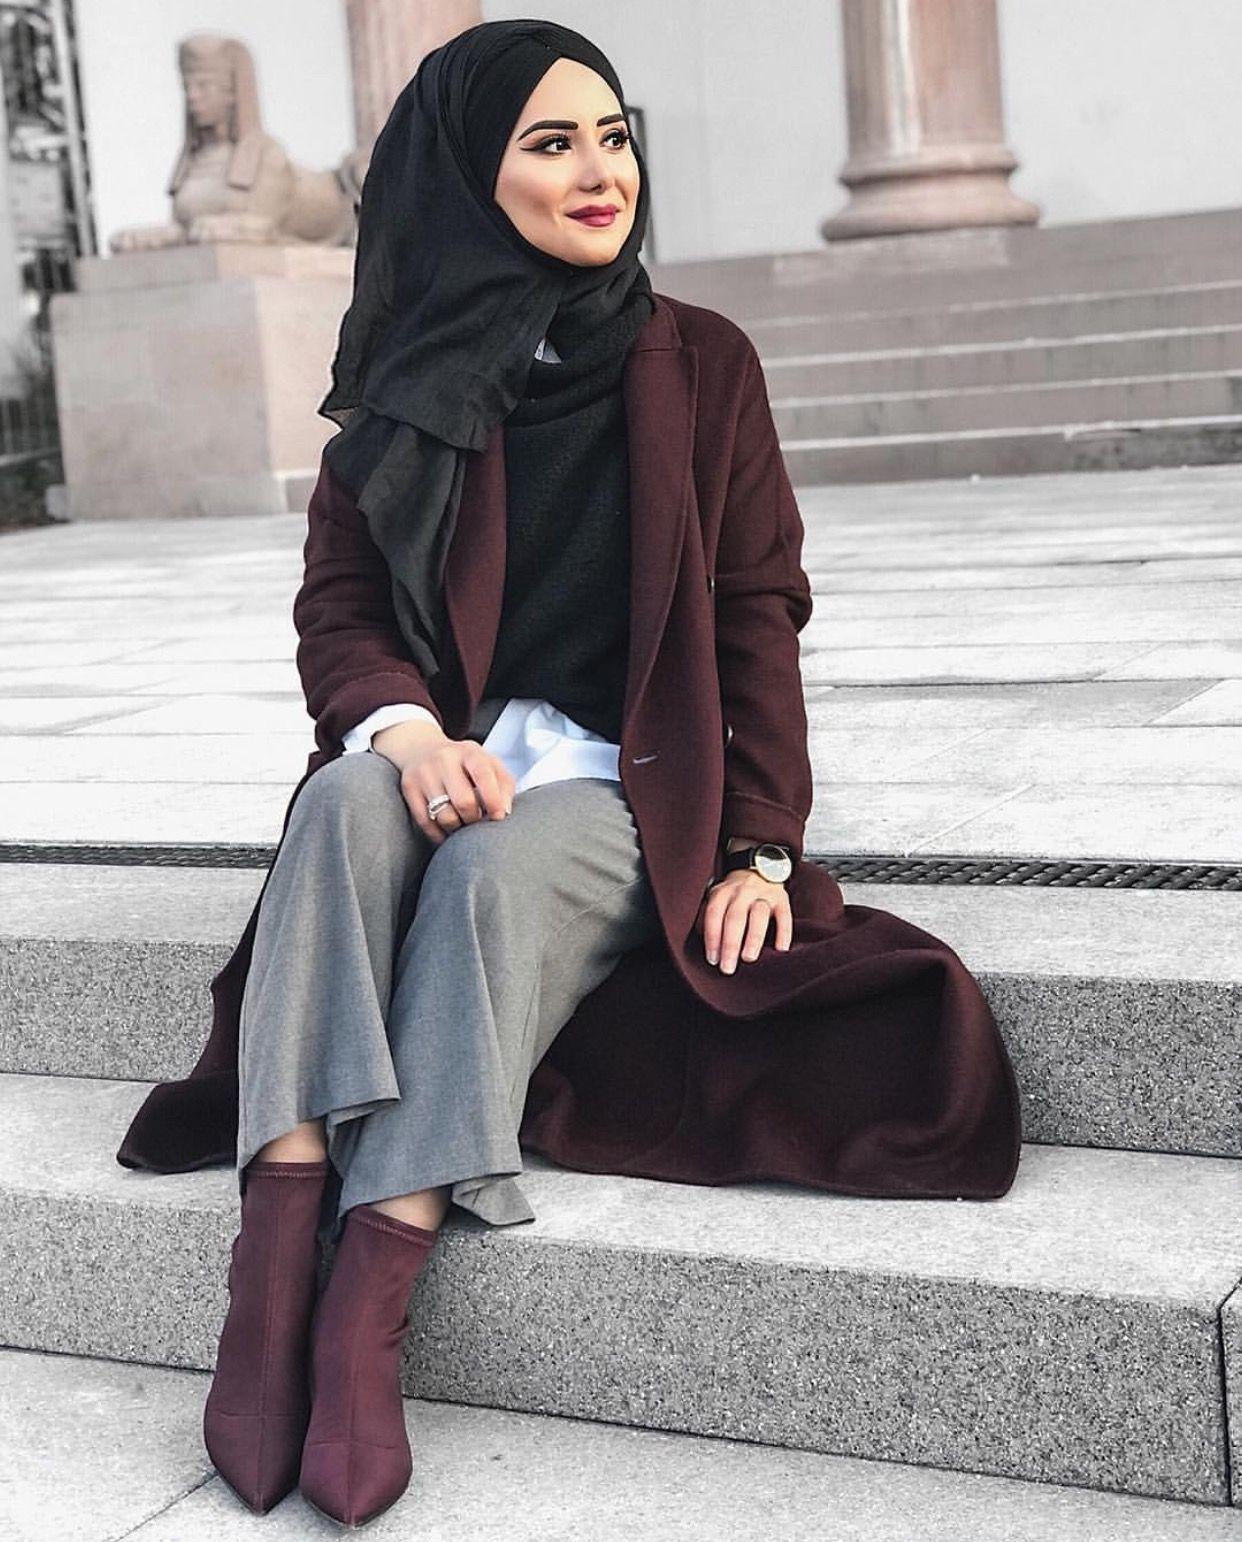 ig rbiaa yldz winter fashion hijab fashionista hijab. Black Bedroom Furniture Sets. Home Design Ideas